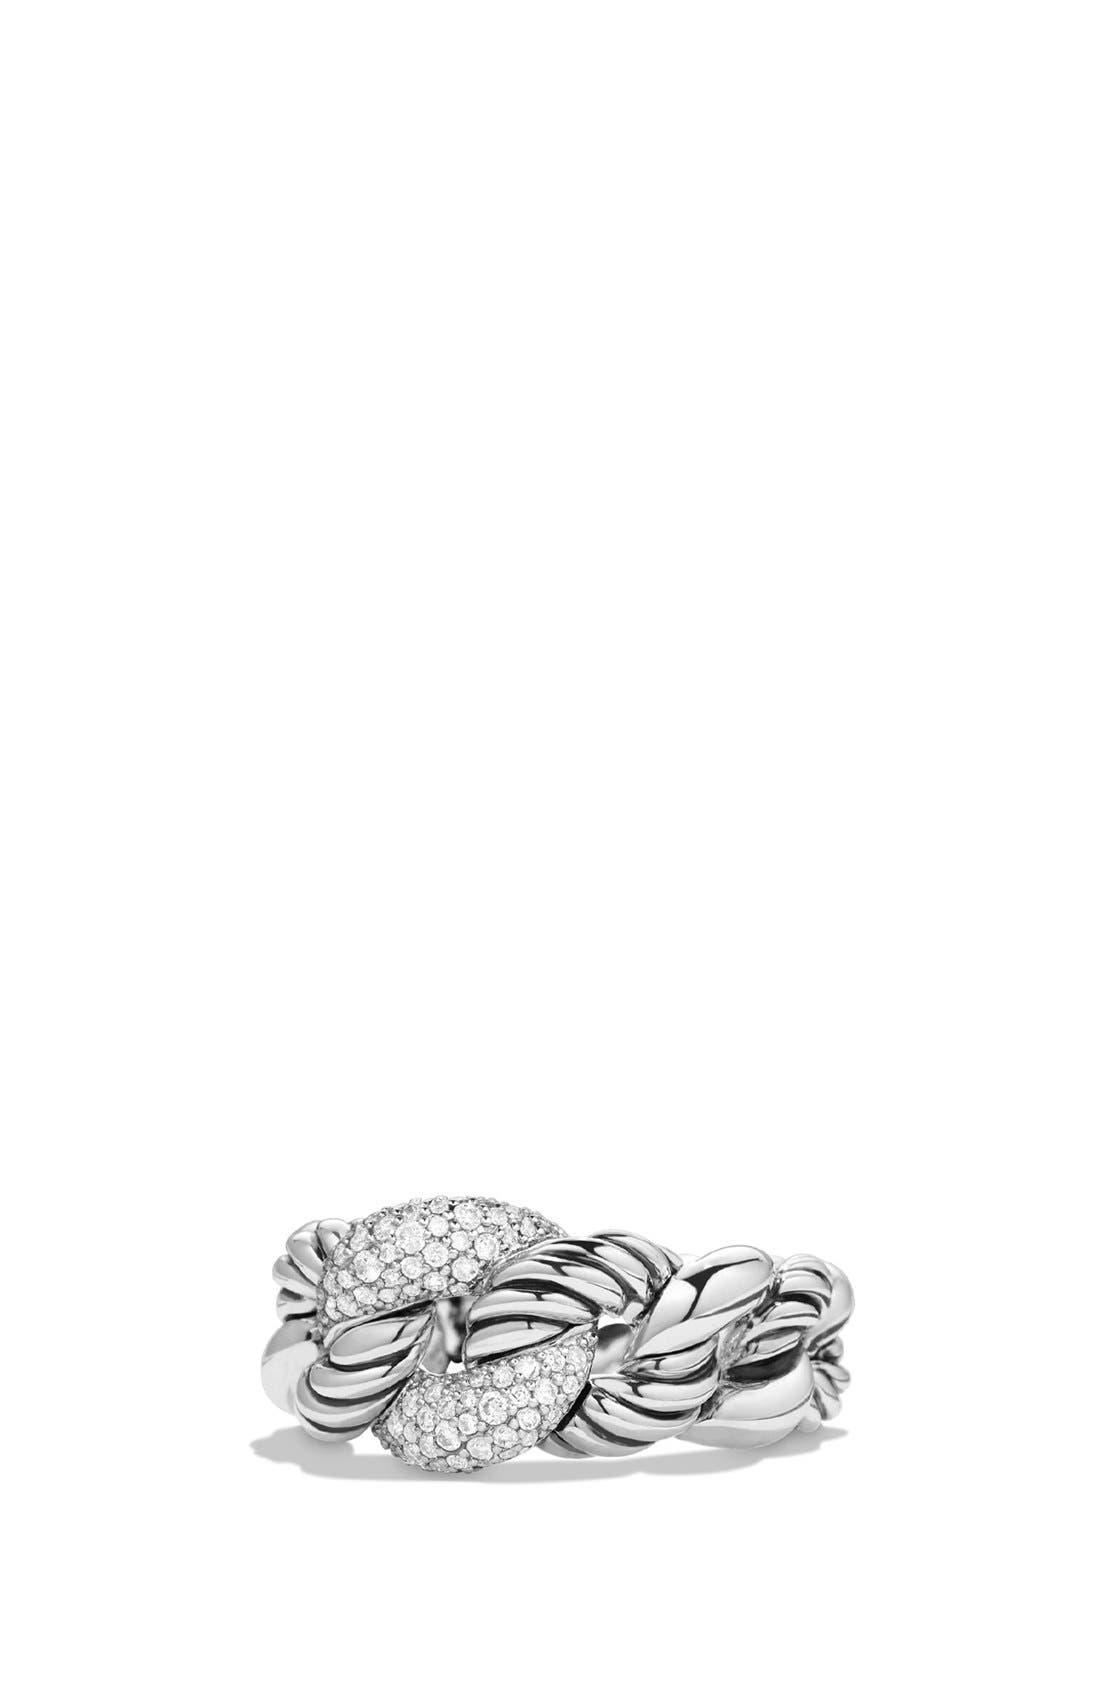 Alternate Image 1 Selected - David Yurman'Belmont' Curb Link Ring with Diamonds